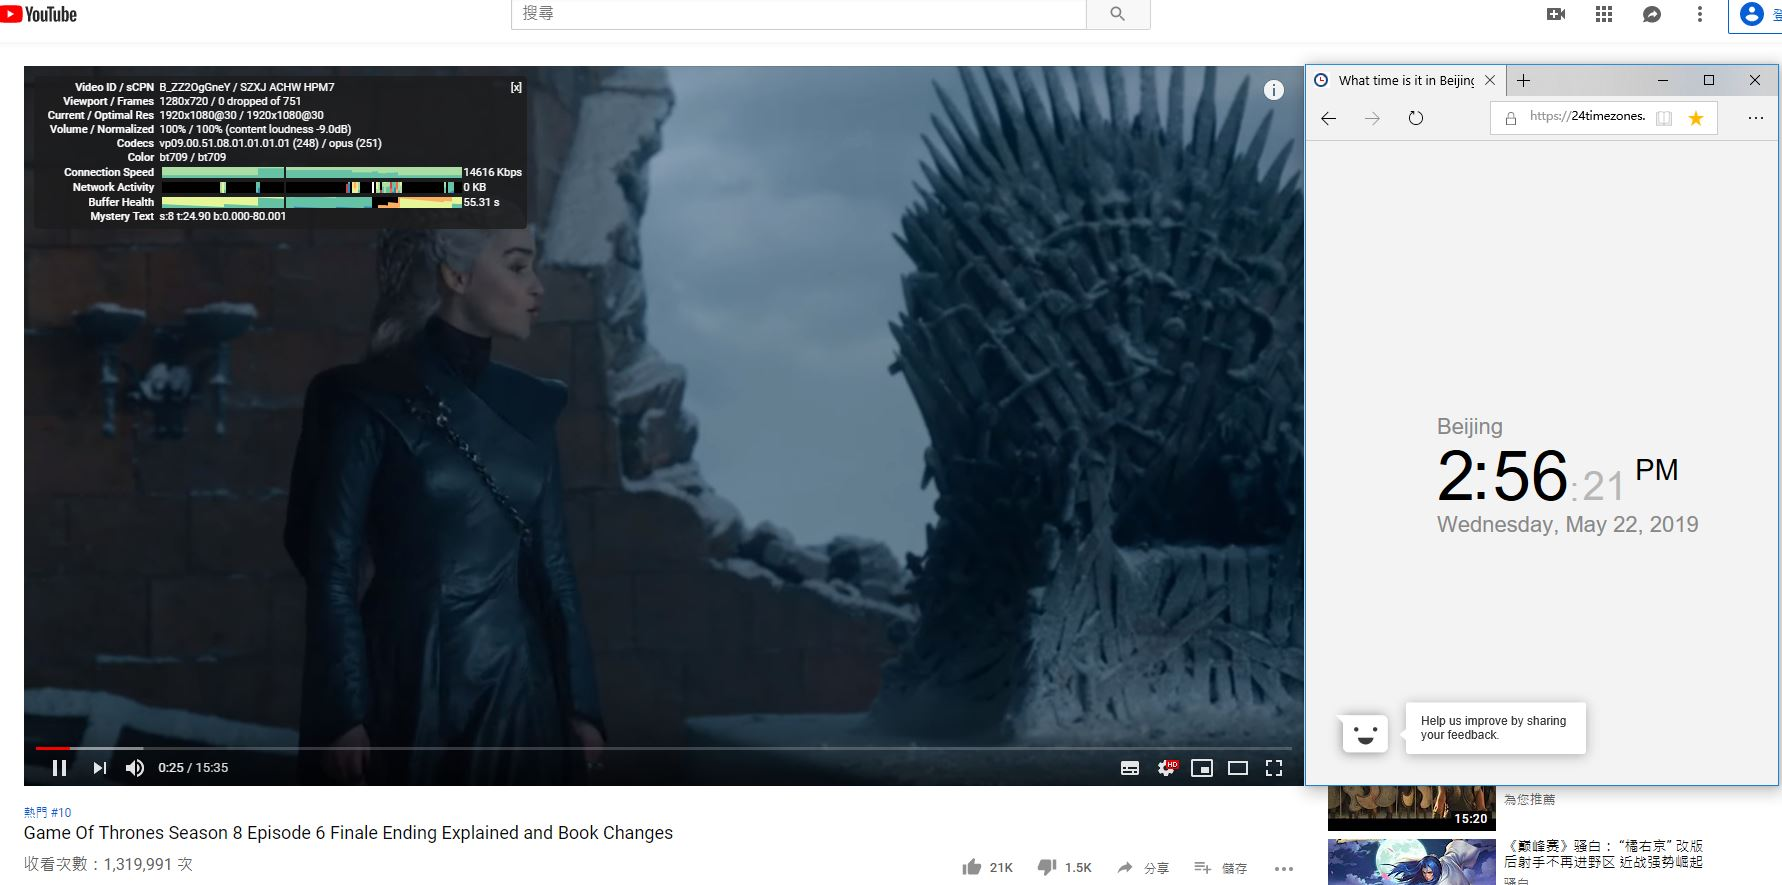 windows-nordvpn-混淆服务器连接-美国2679节点-连接成功-YouTube-20190522